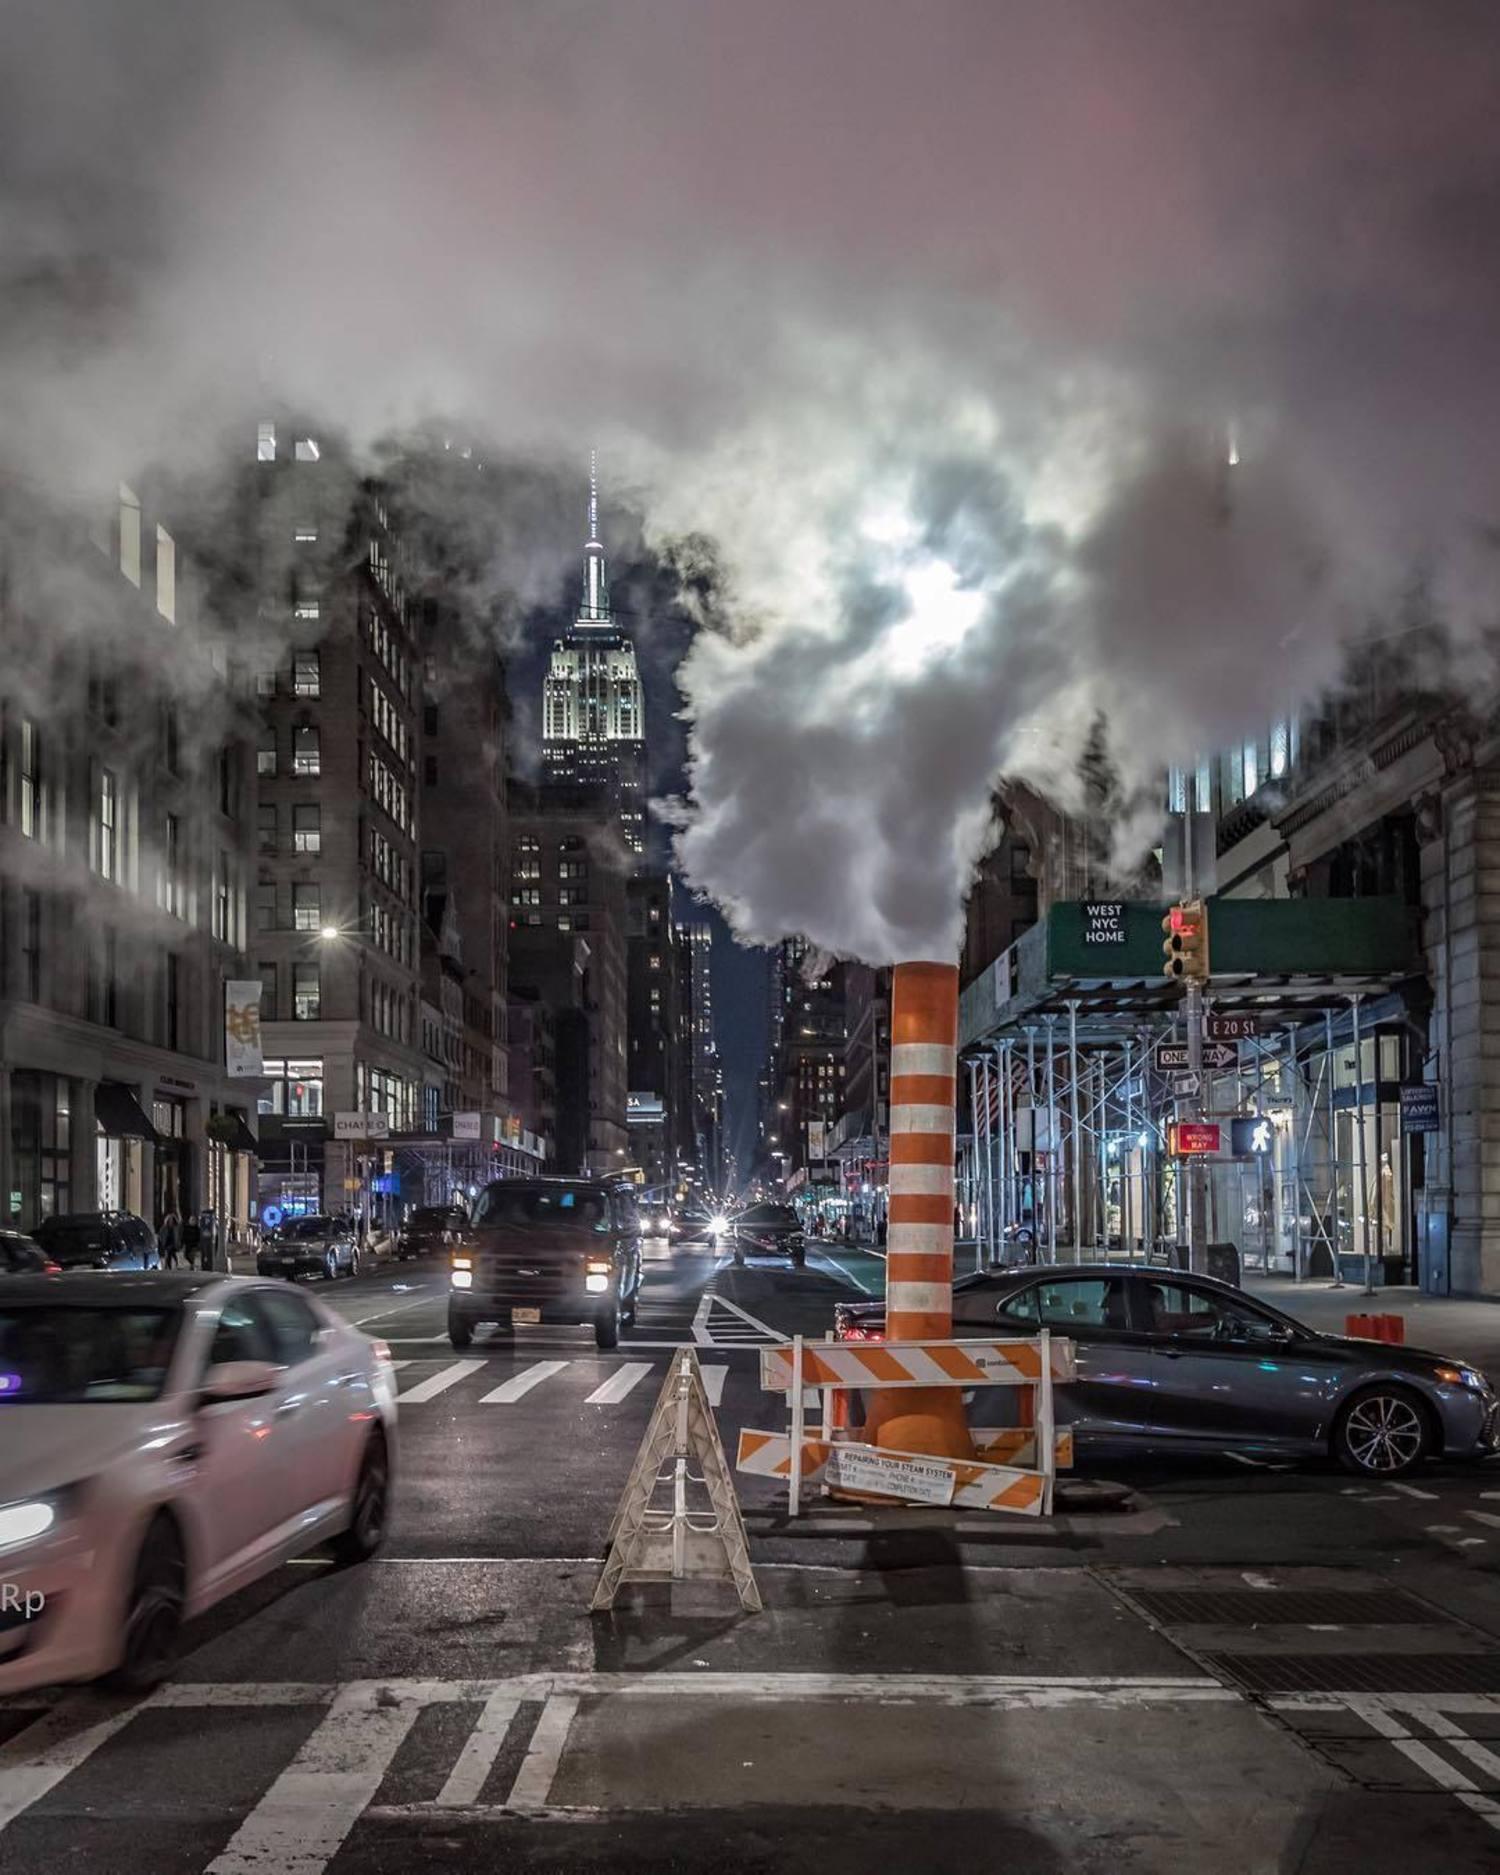 New York, New York. Photo via @ricp2206 #viewingnyc #nyc #newyork #newyorkcity #empirestatebuilding